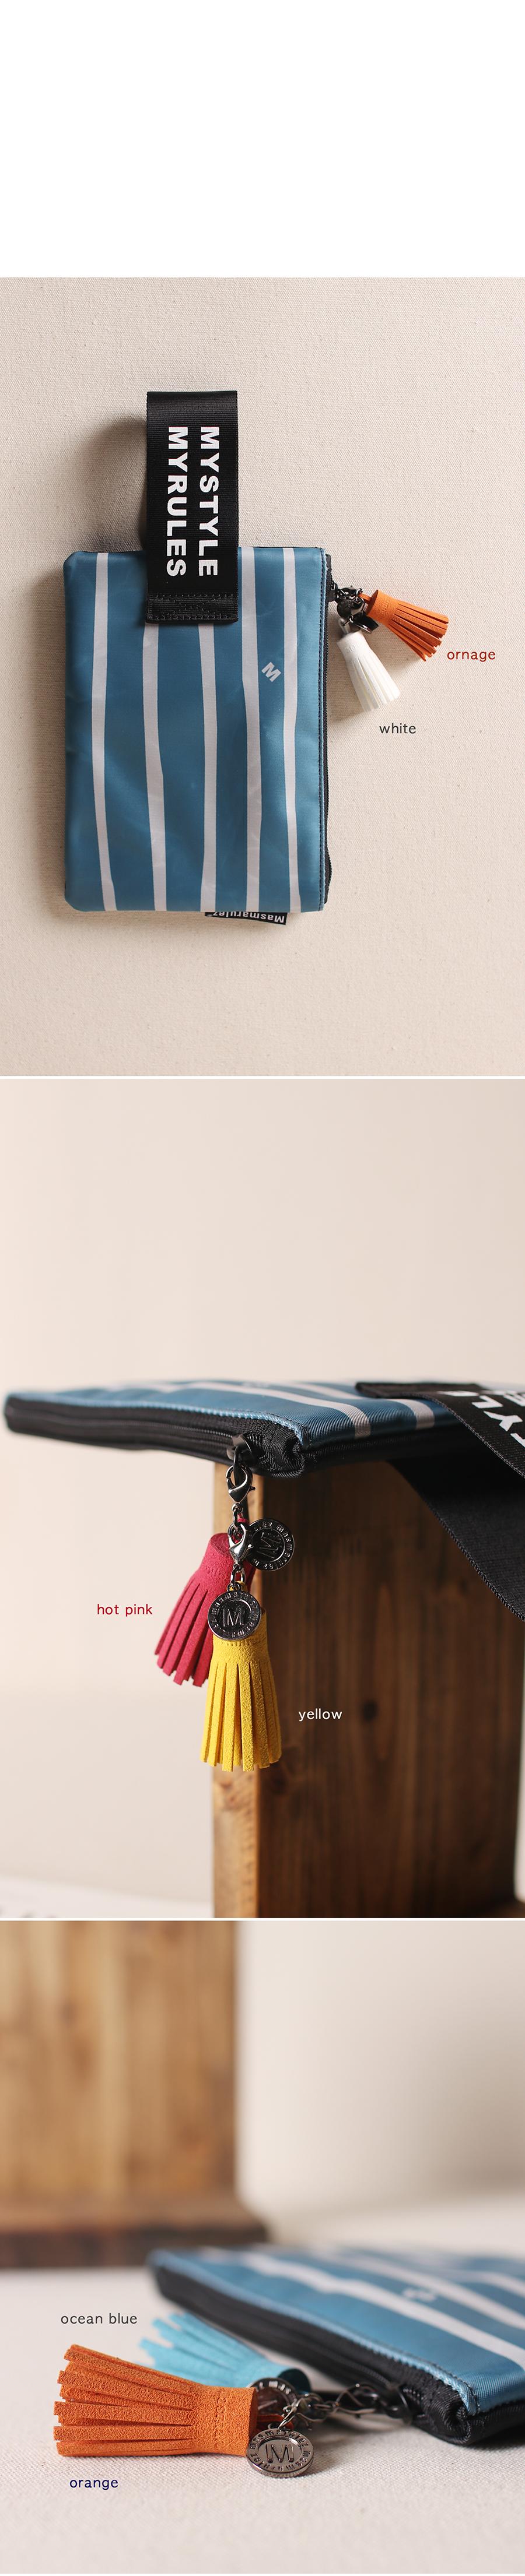 Wide light blue line 마약 스트랩 파우치 - 마스마룰즈, 13,520원, 다용도파우치, 지퍼형